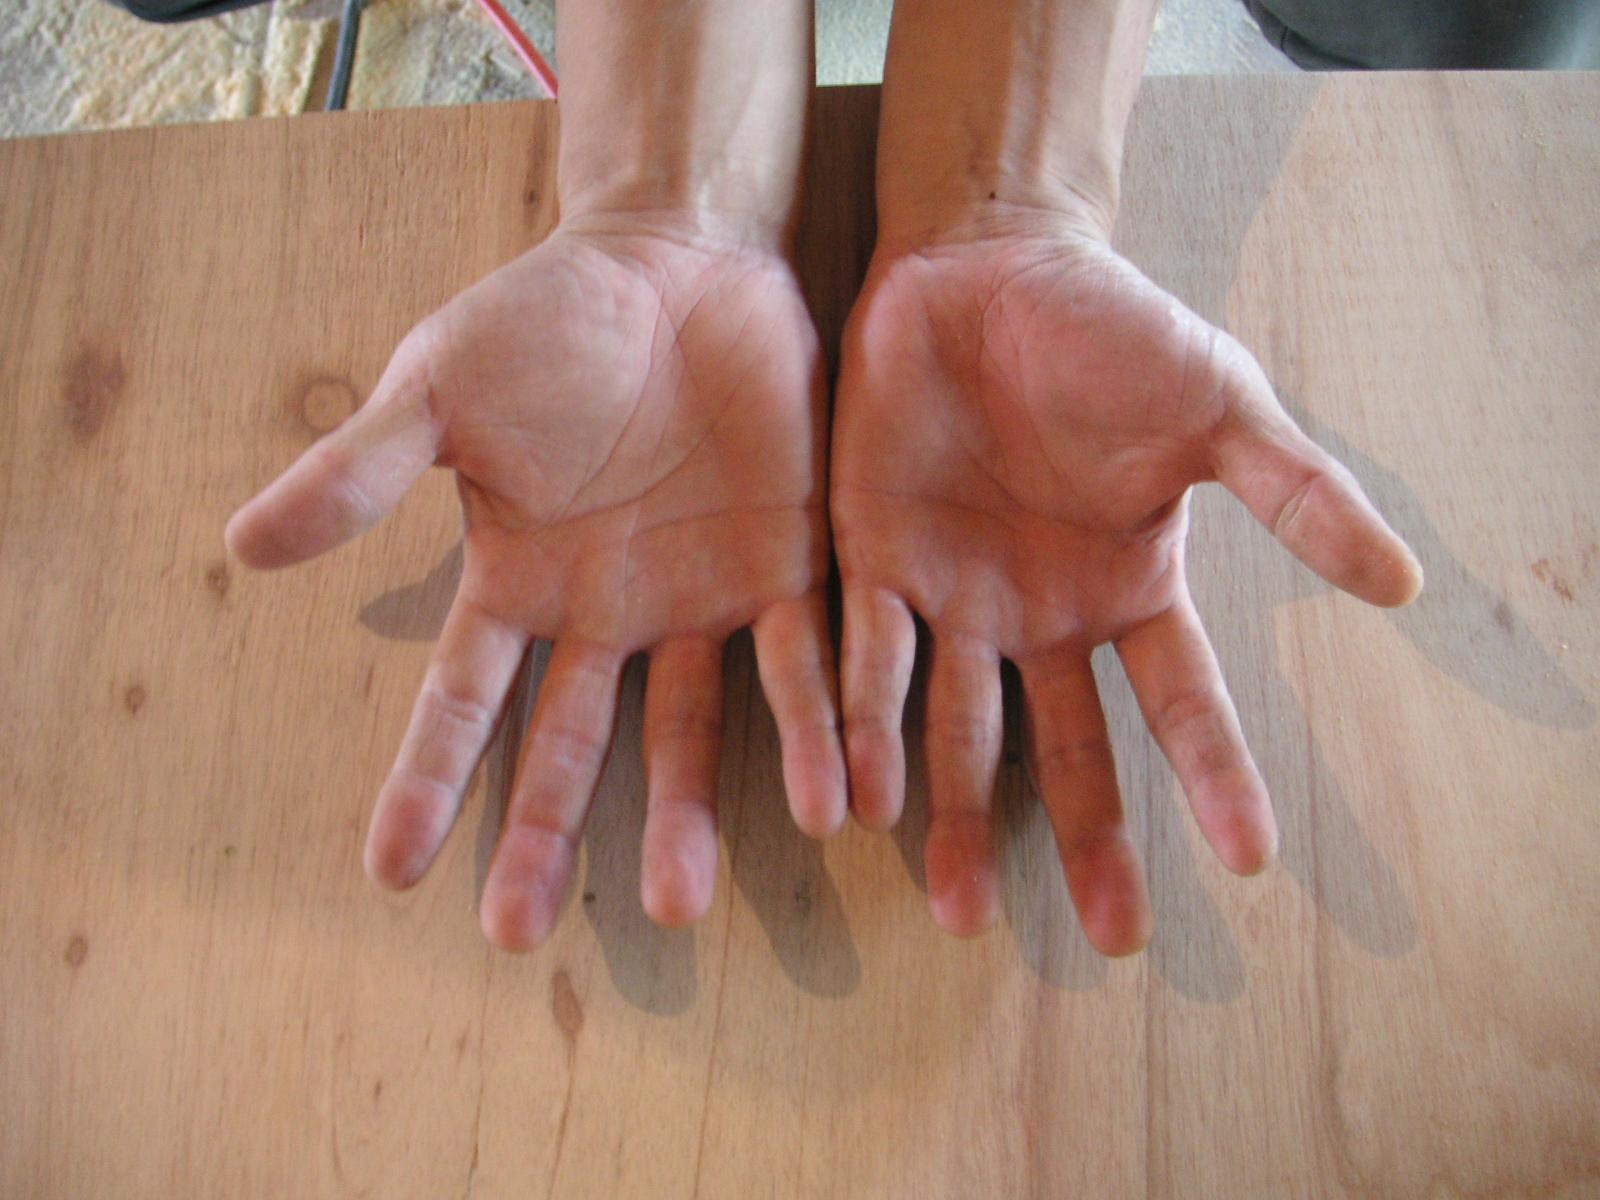 sizensozai 白井くんの手。 マツミの新しい手。 元気な手。 そう元気な手。 これか..